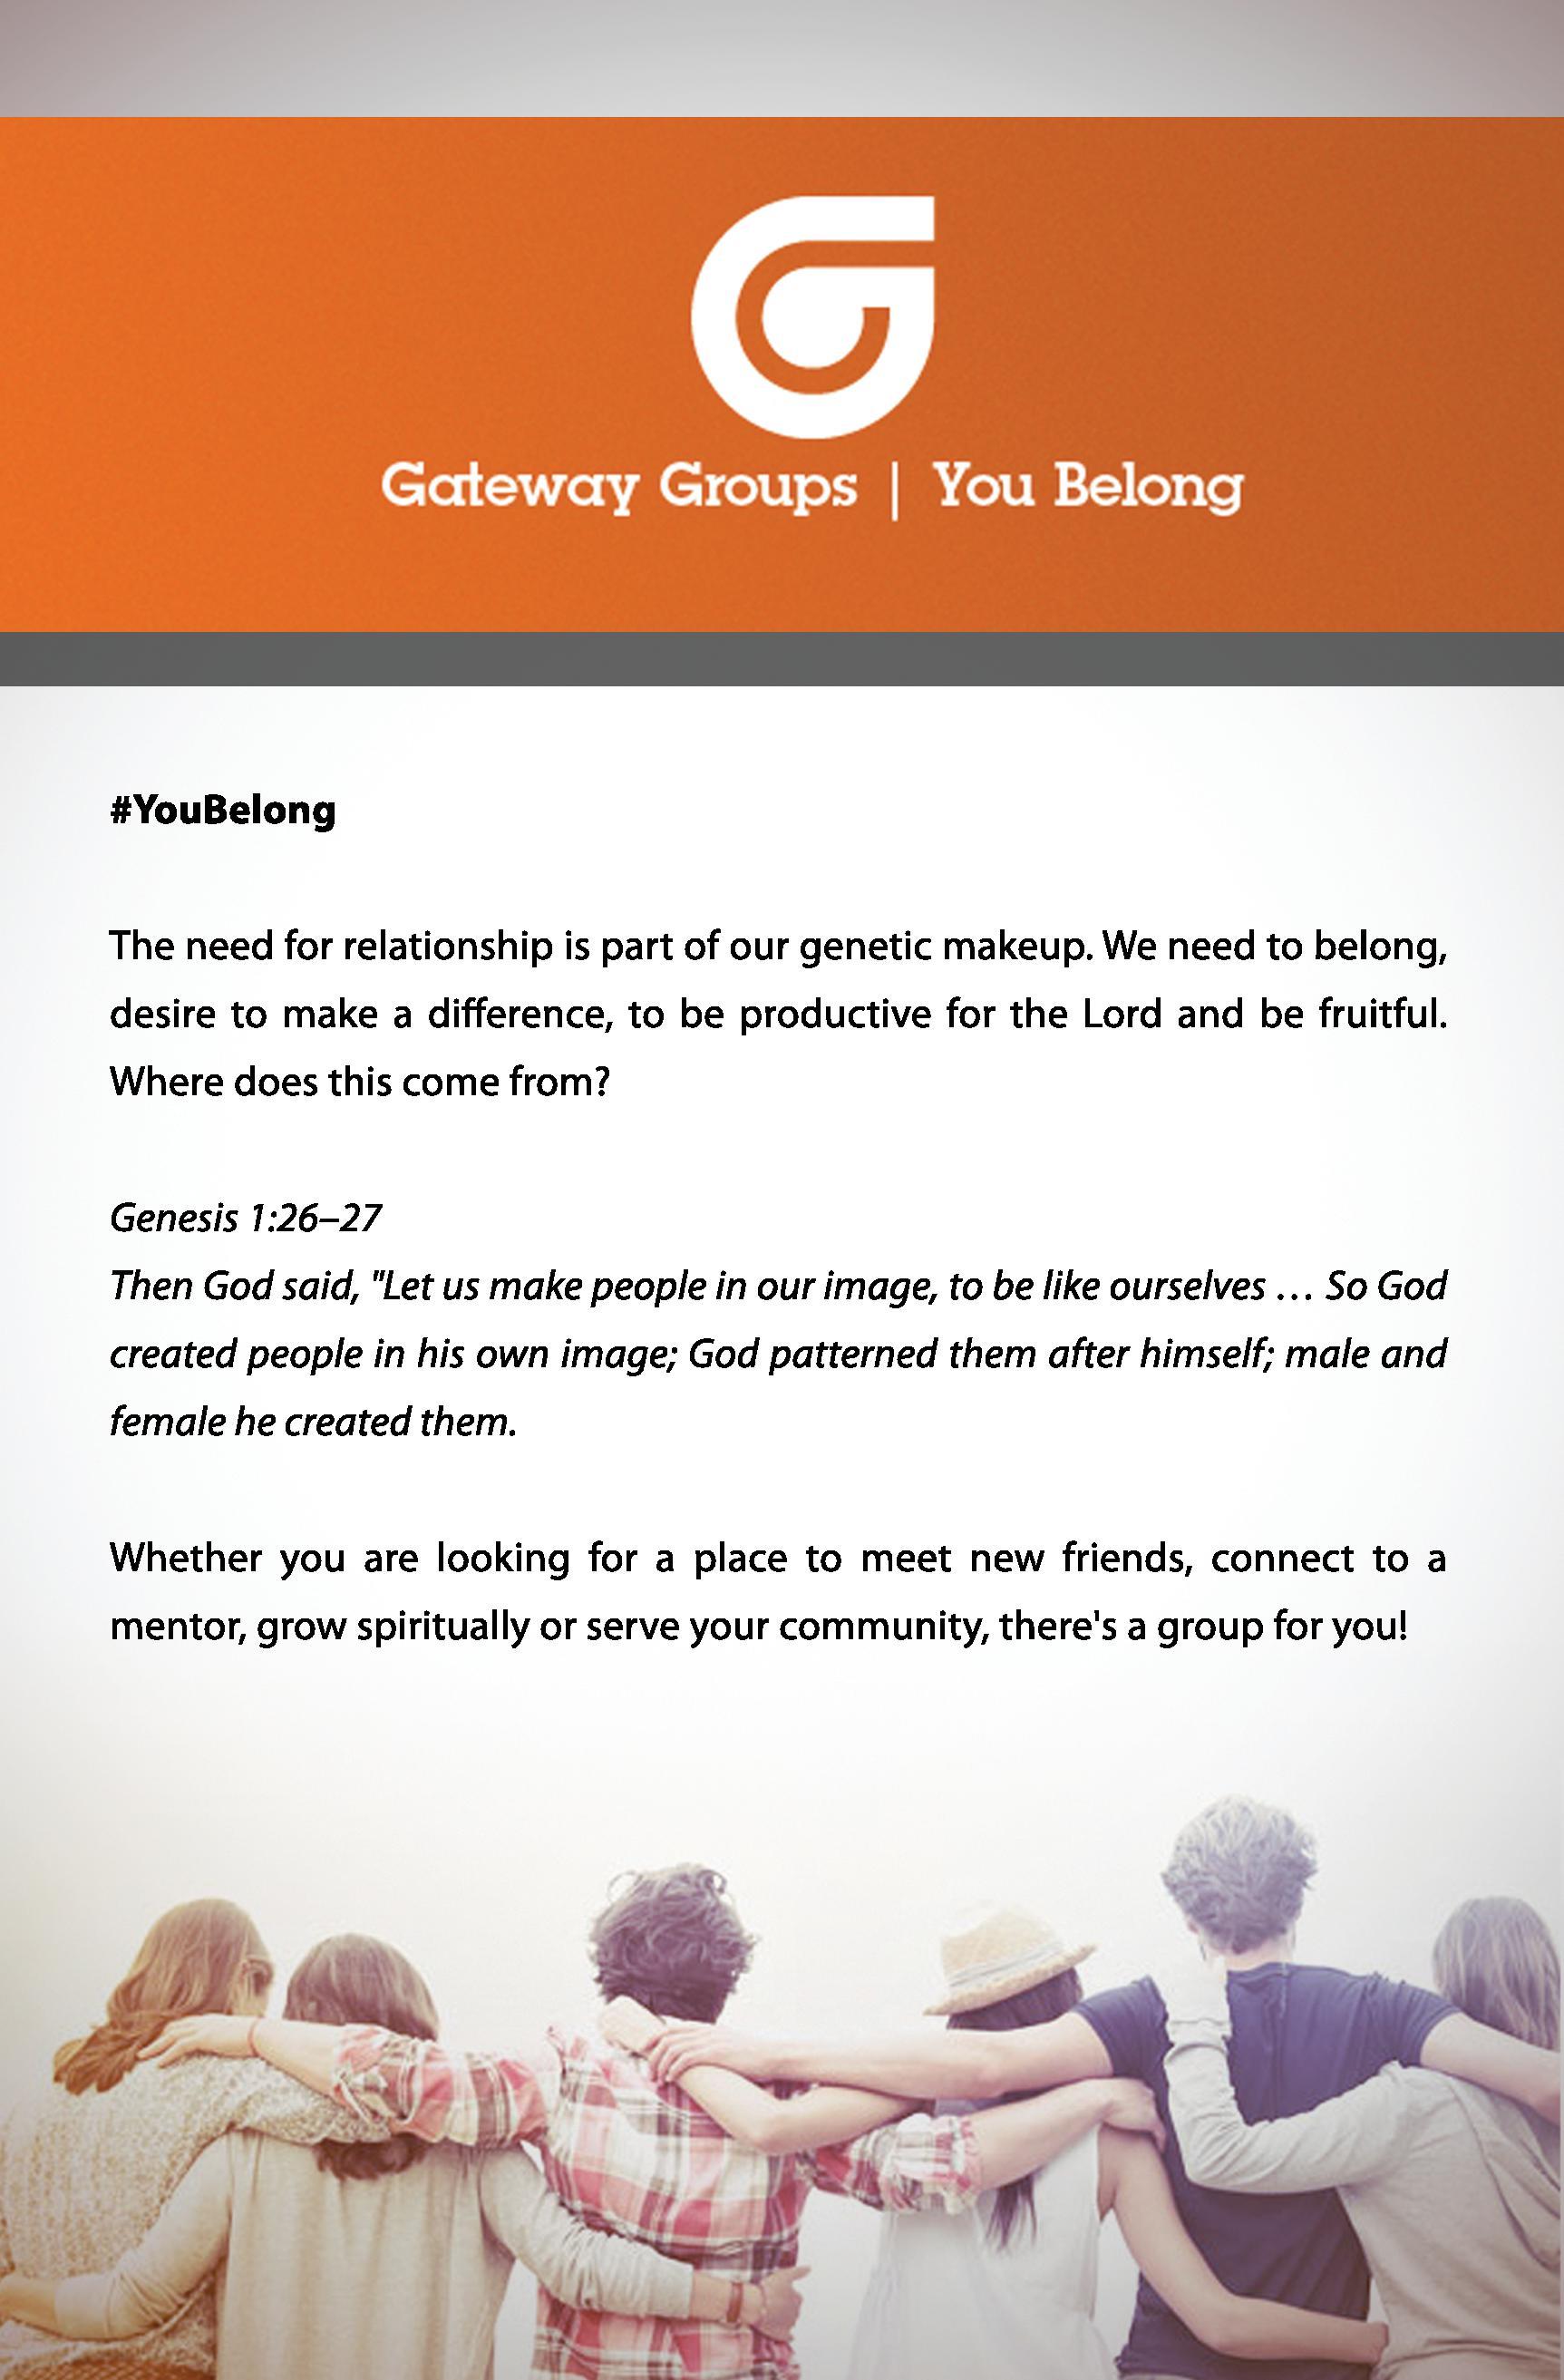 Gateway Groups